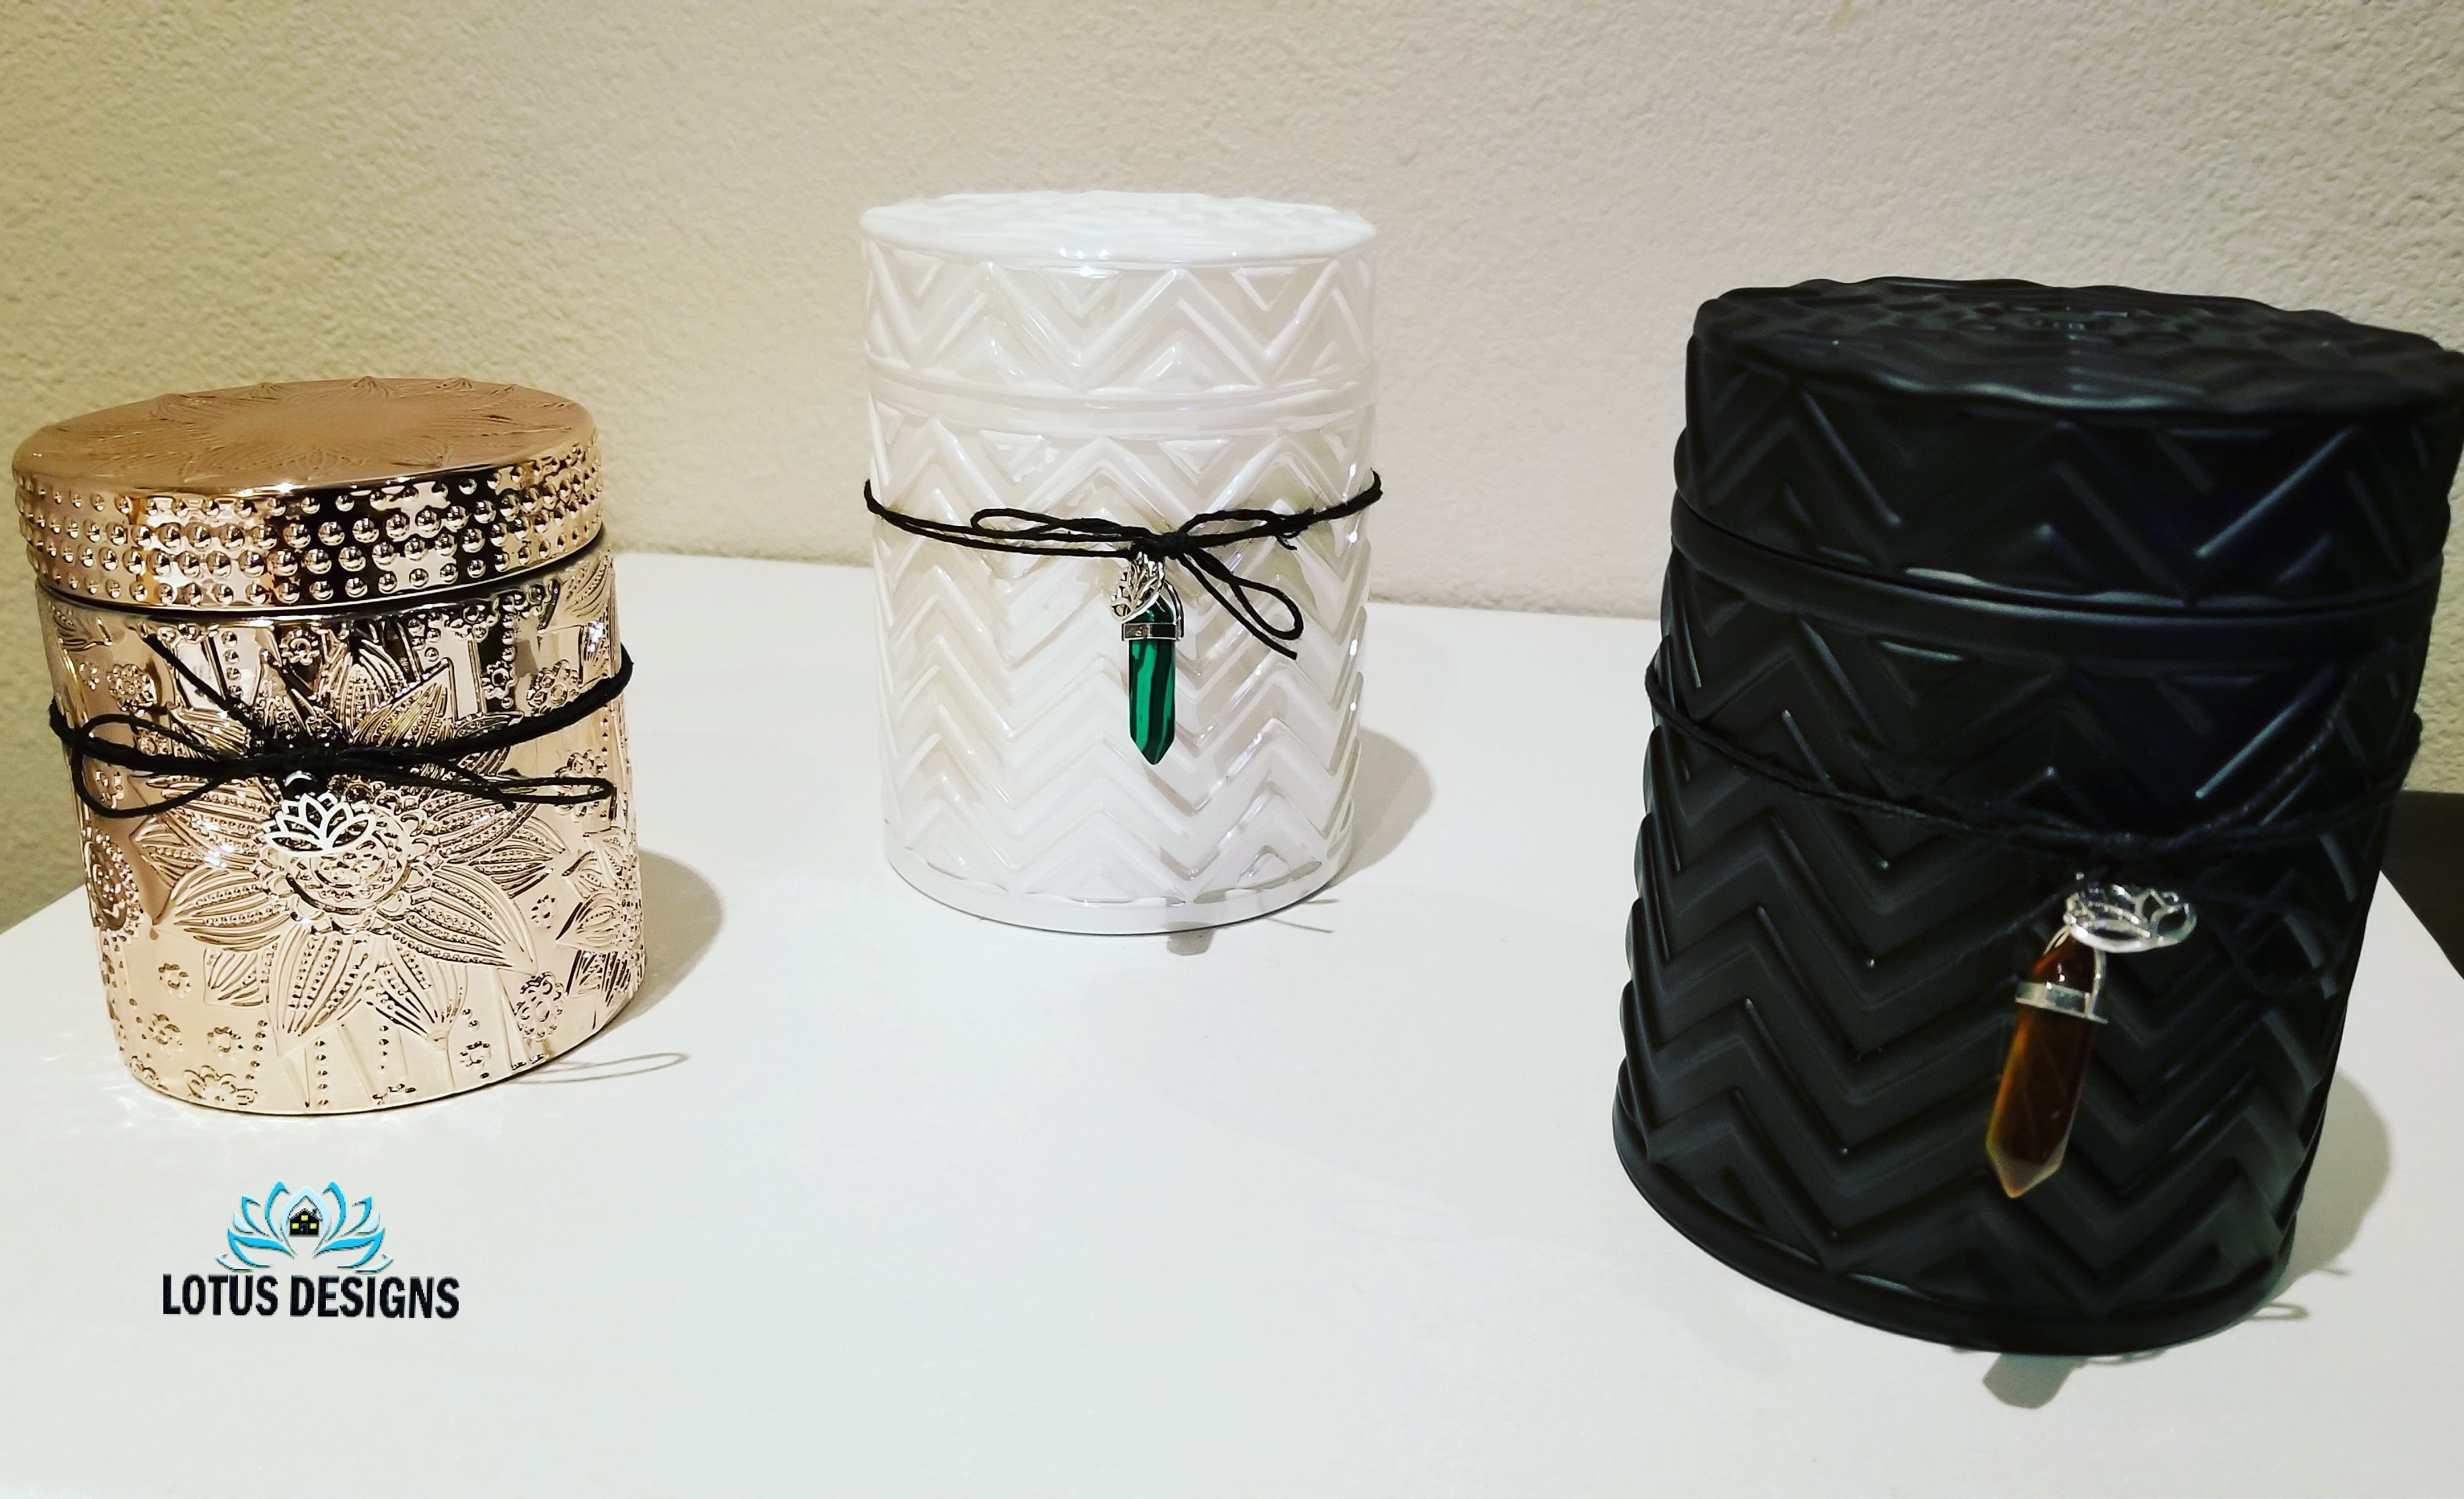 http://lotusdesignpro.com/wp-content/uploads/2019/09/all-candles.jpg